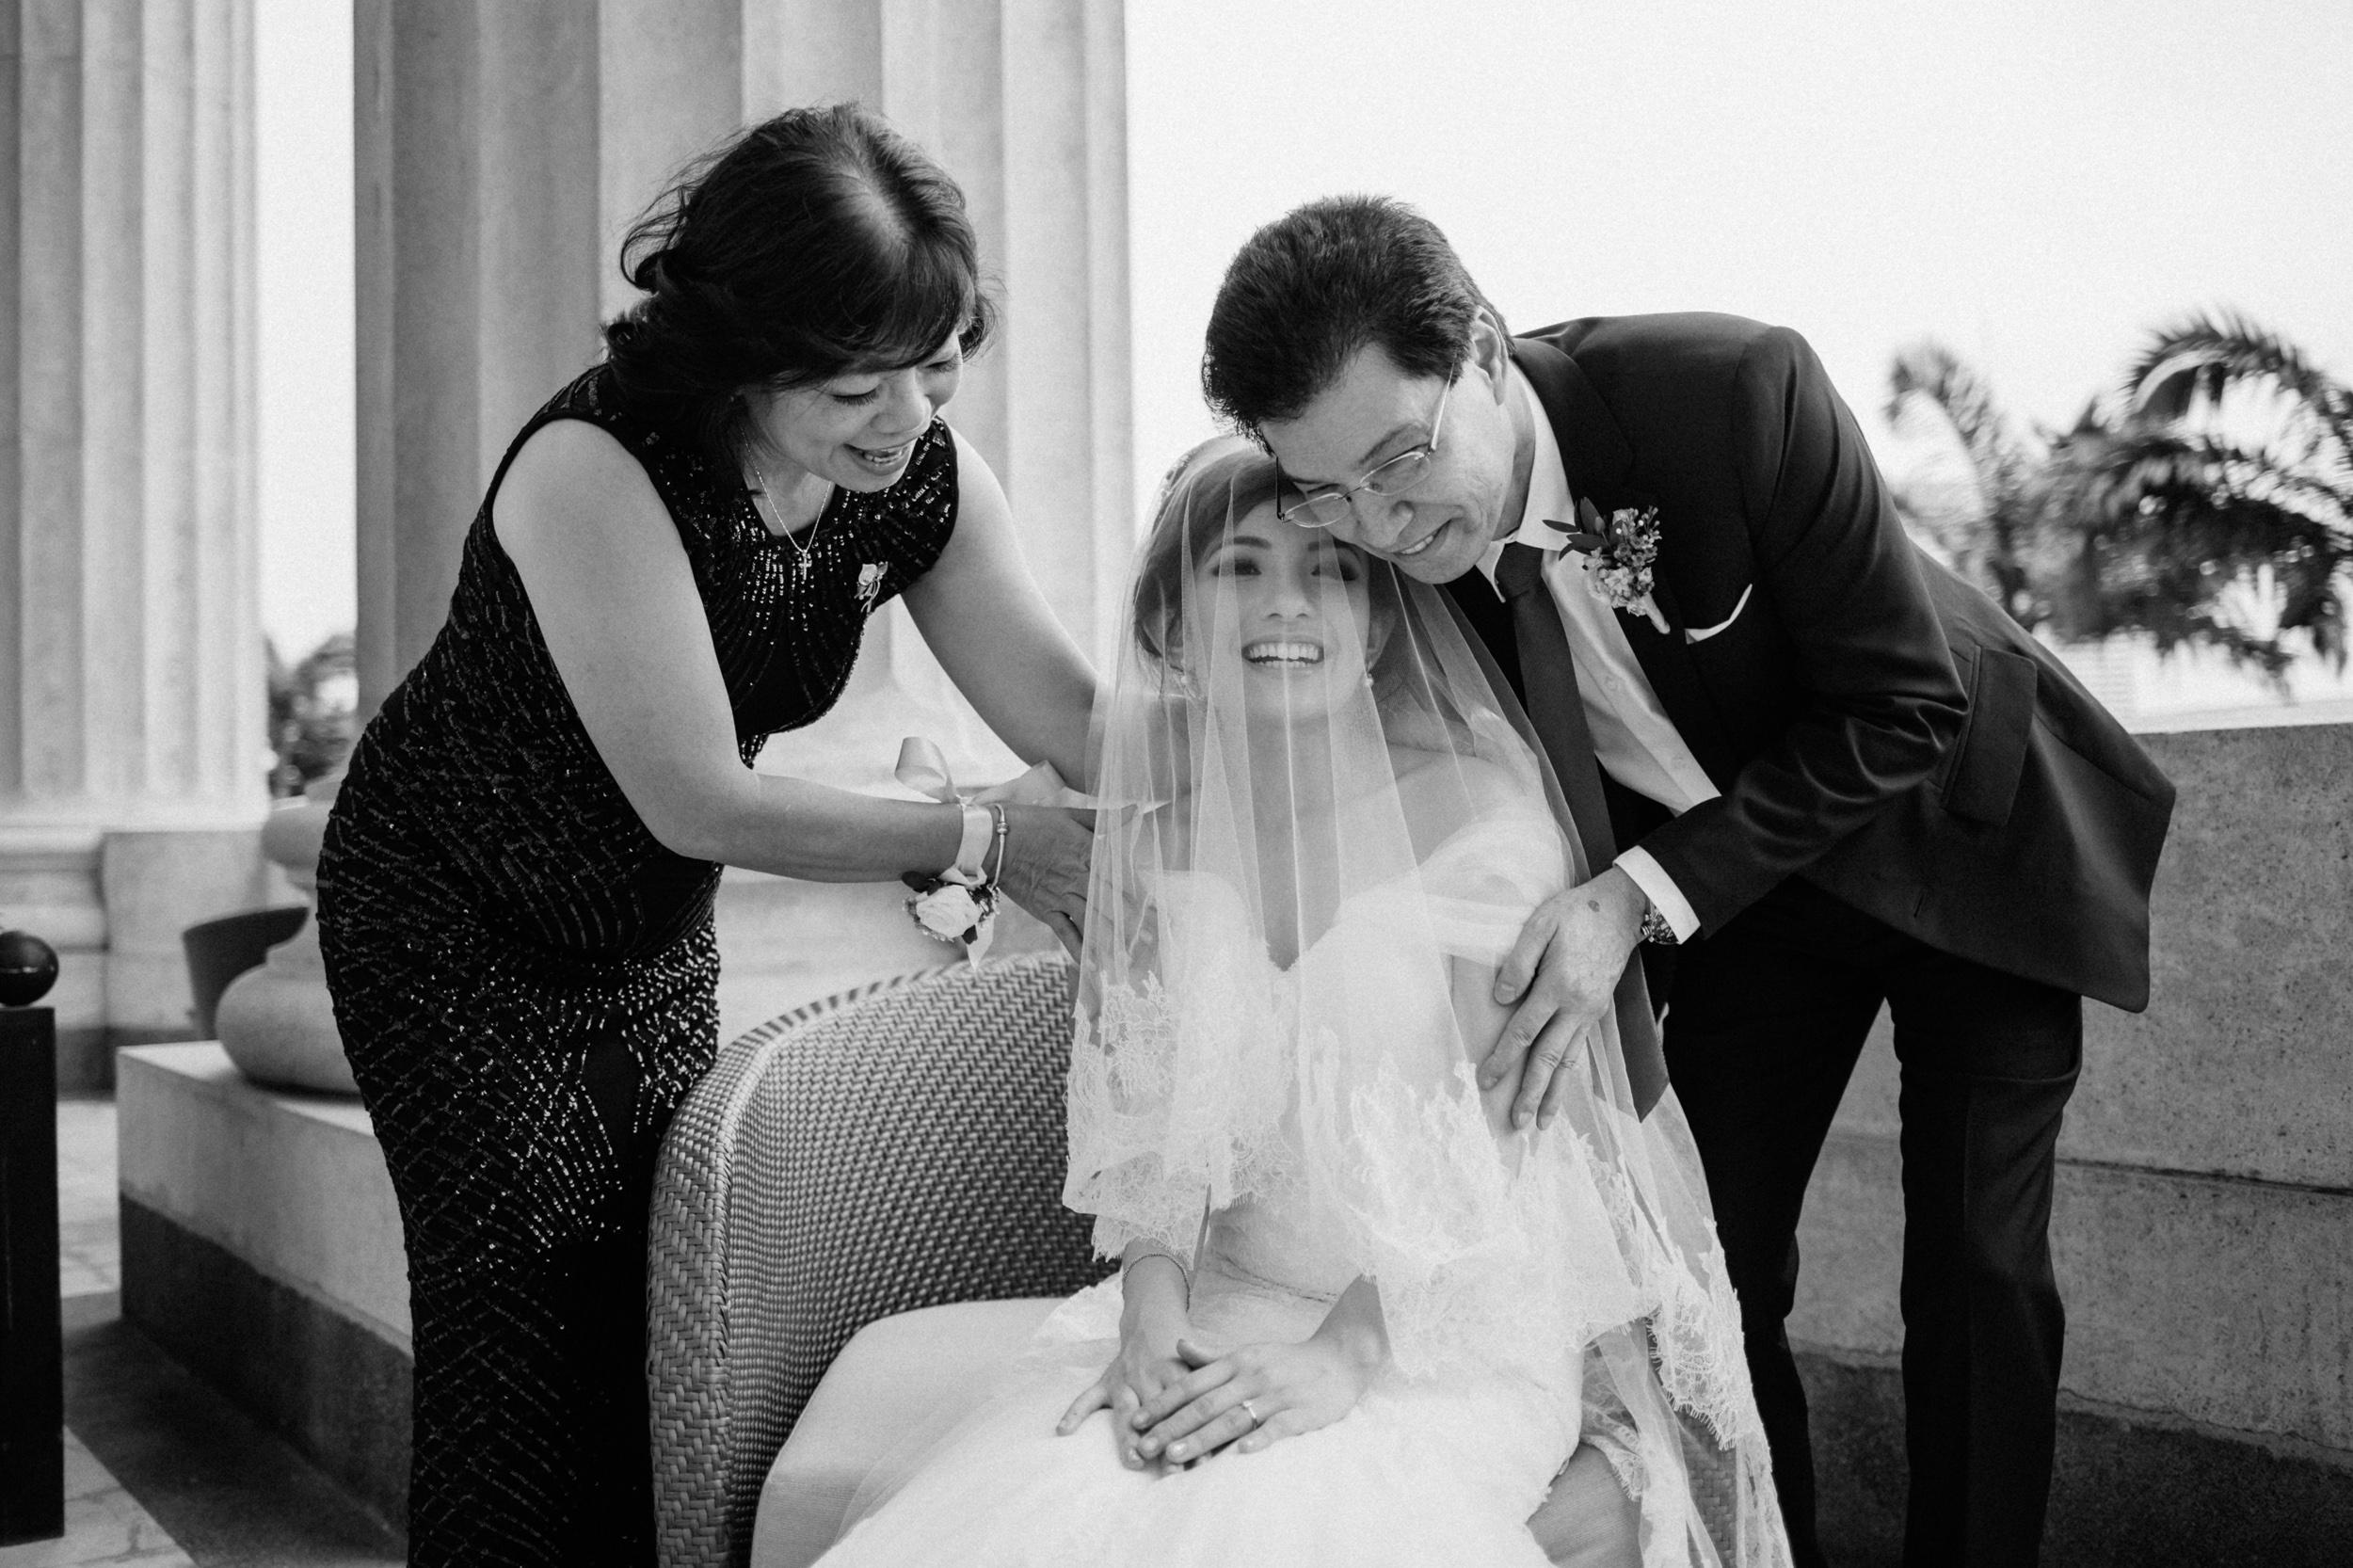 singapore-wedding-photographer-cheryl-matthew-fullerton-hotel-wedding-51.jpg